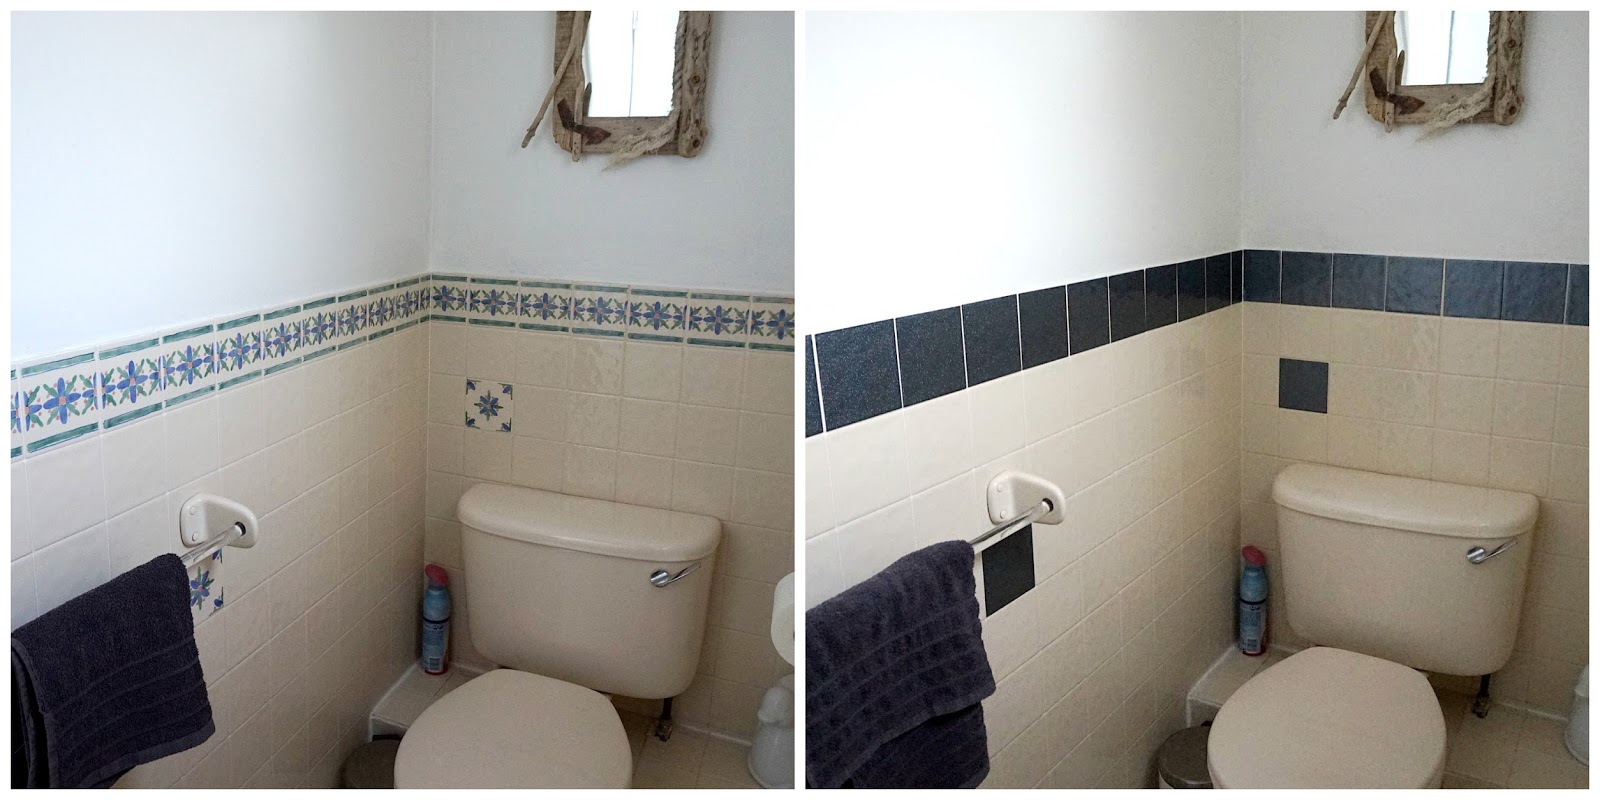 DIY Bathroom Decoration | Tile Stickers - Jenna Suth